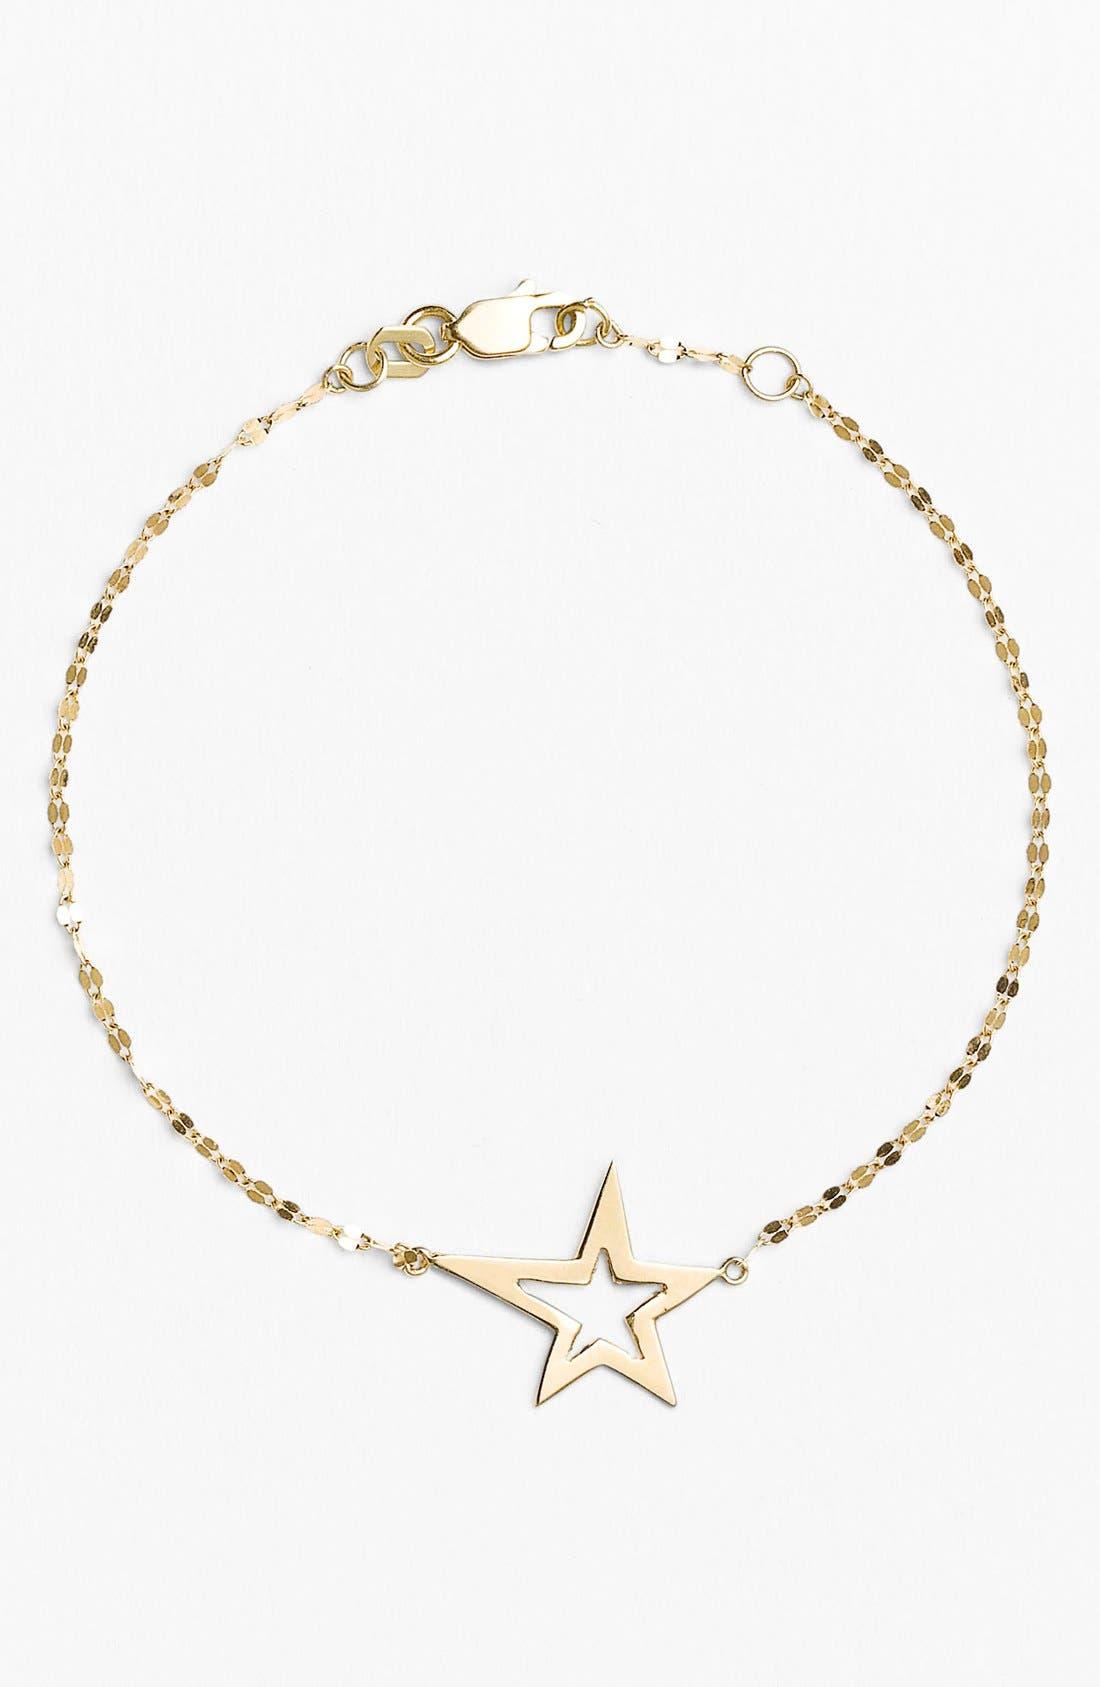 Alternate Image 1 Selected - Lana Jewelry Star Station Bracelet